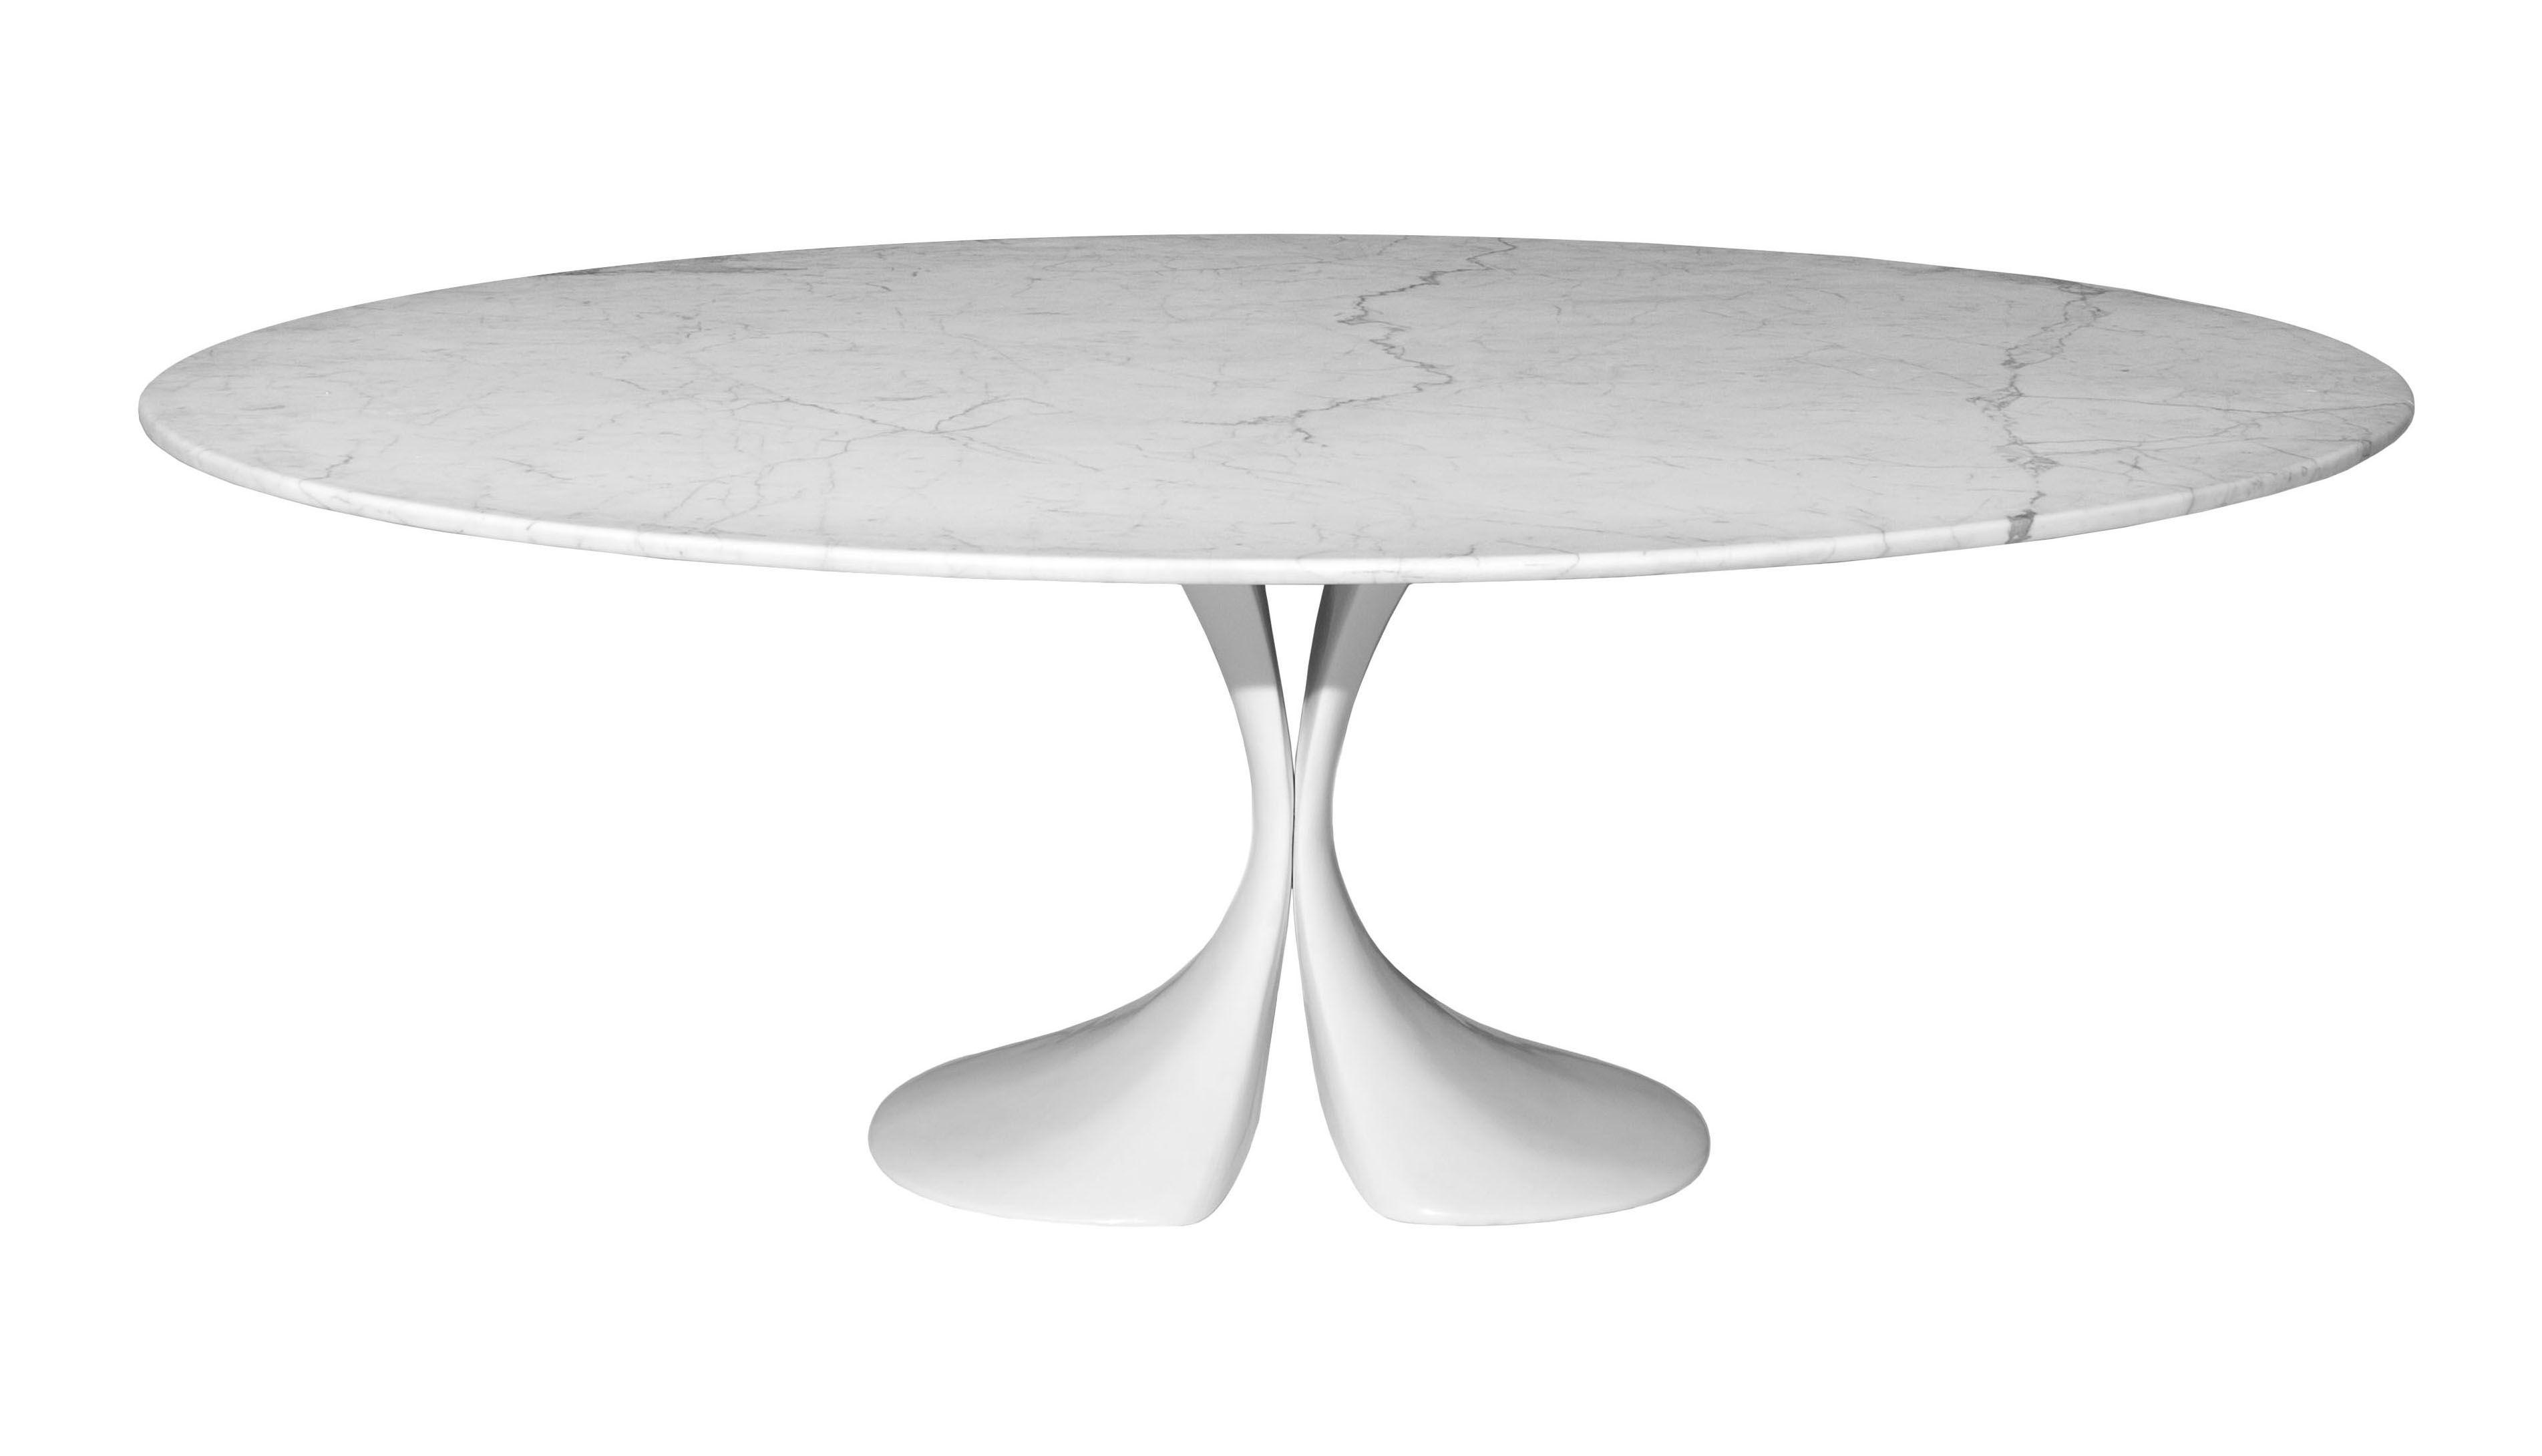 ... Tendances   Espace Repas   Table Ovale Didymos / Marbre   180 X 126 Cm